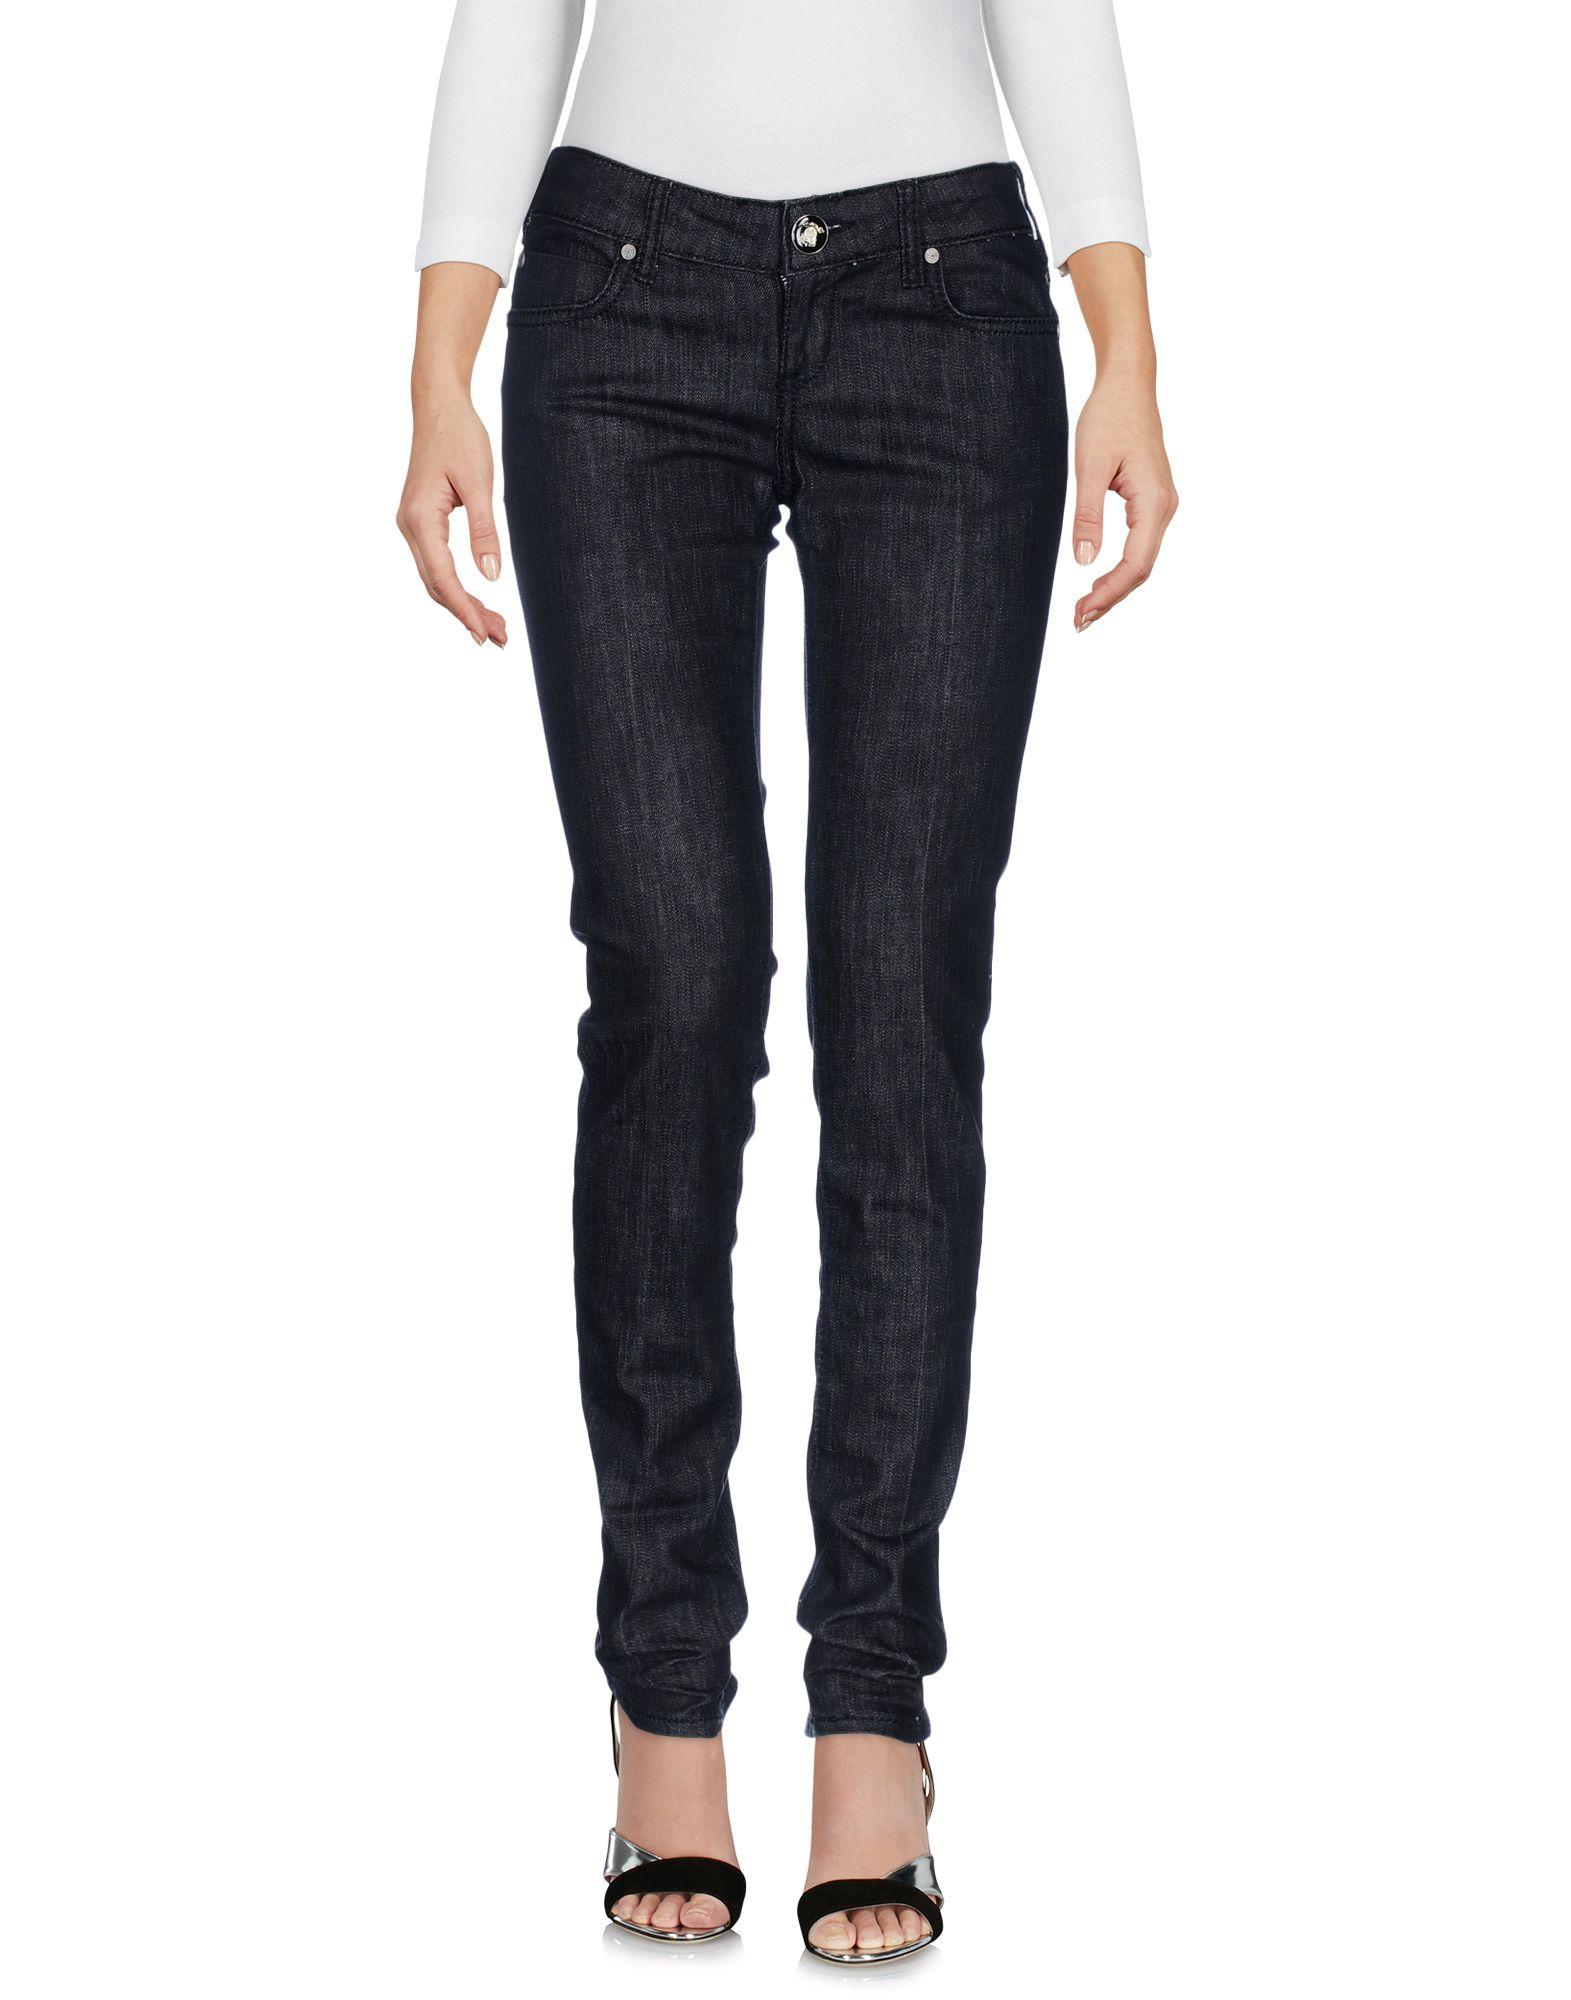 ZU+ELEMENTS Джинсовые брюки